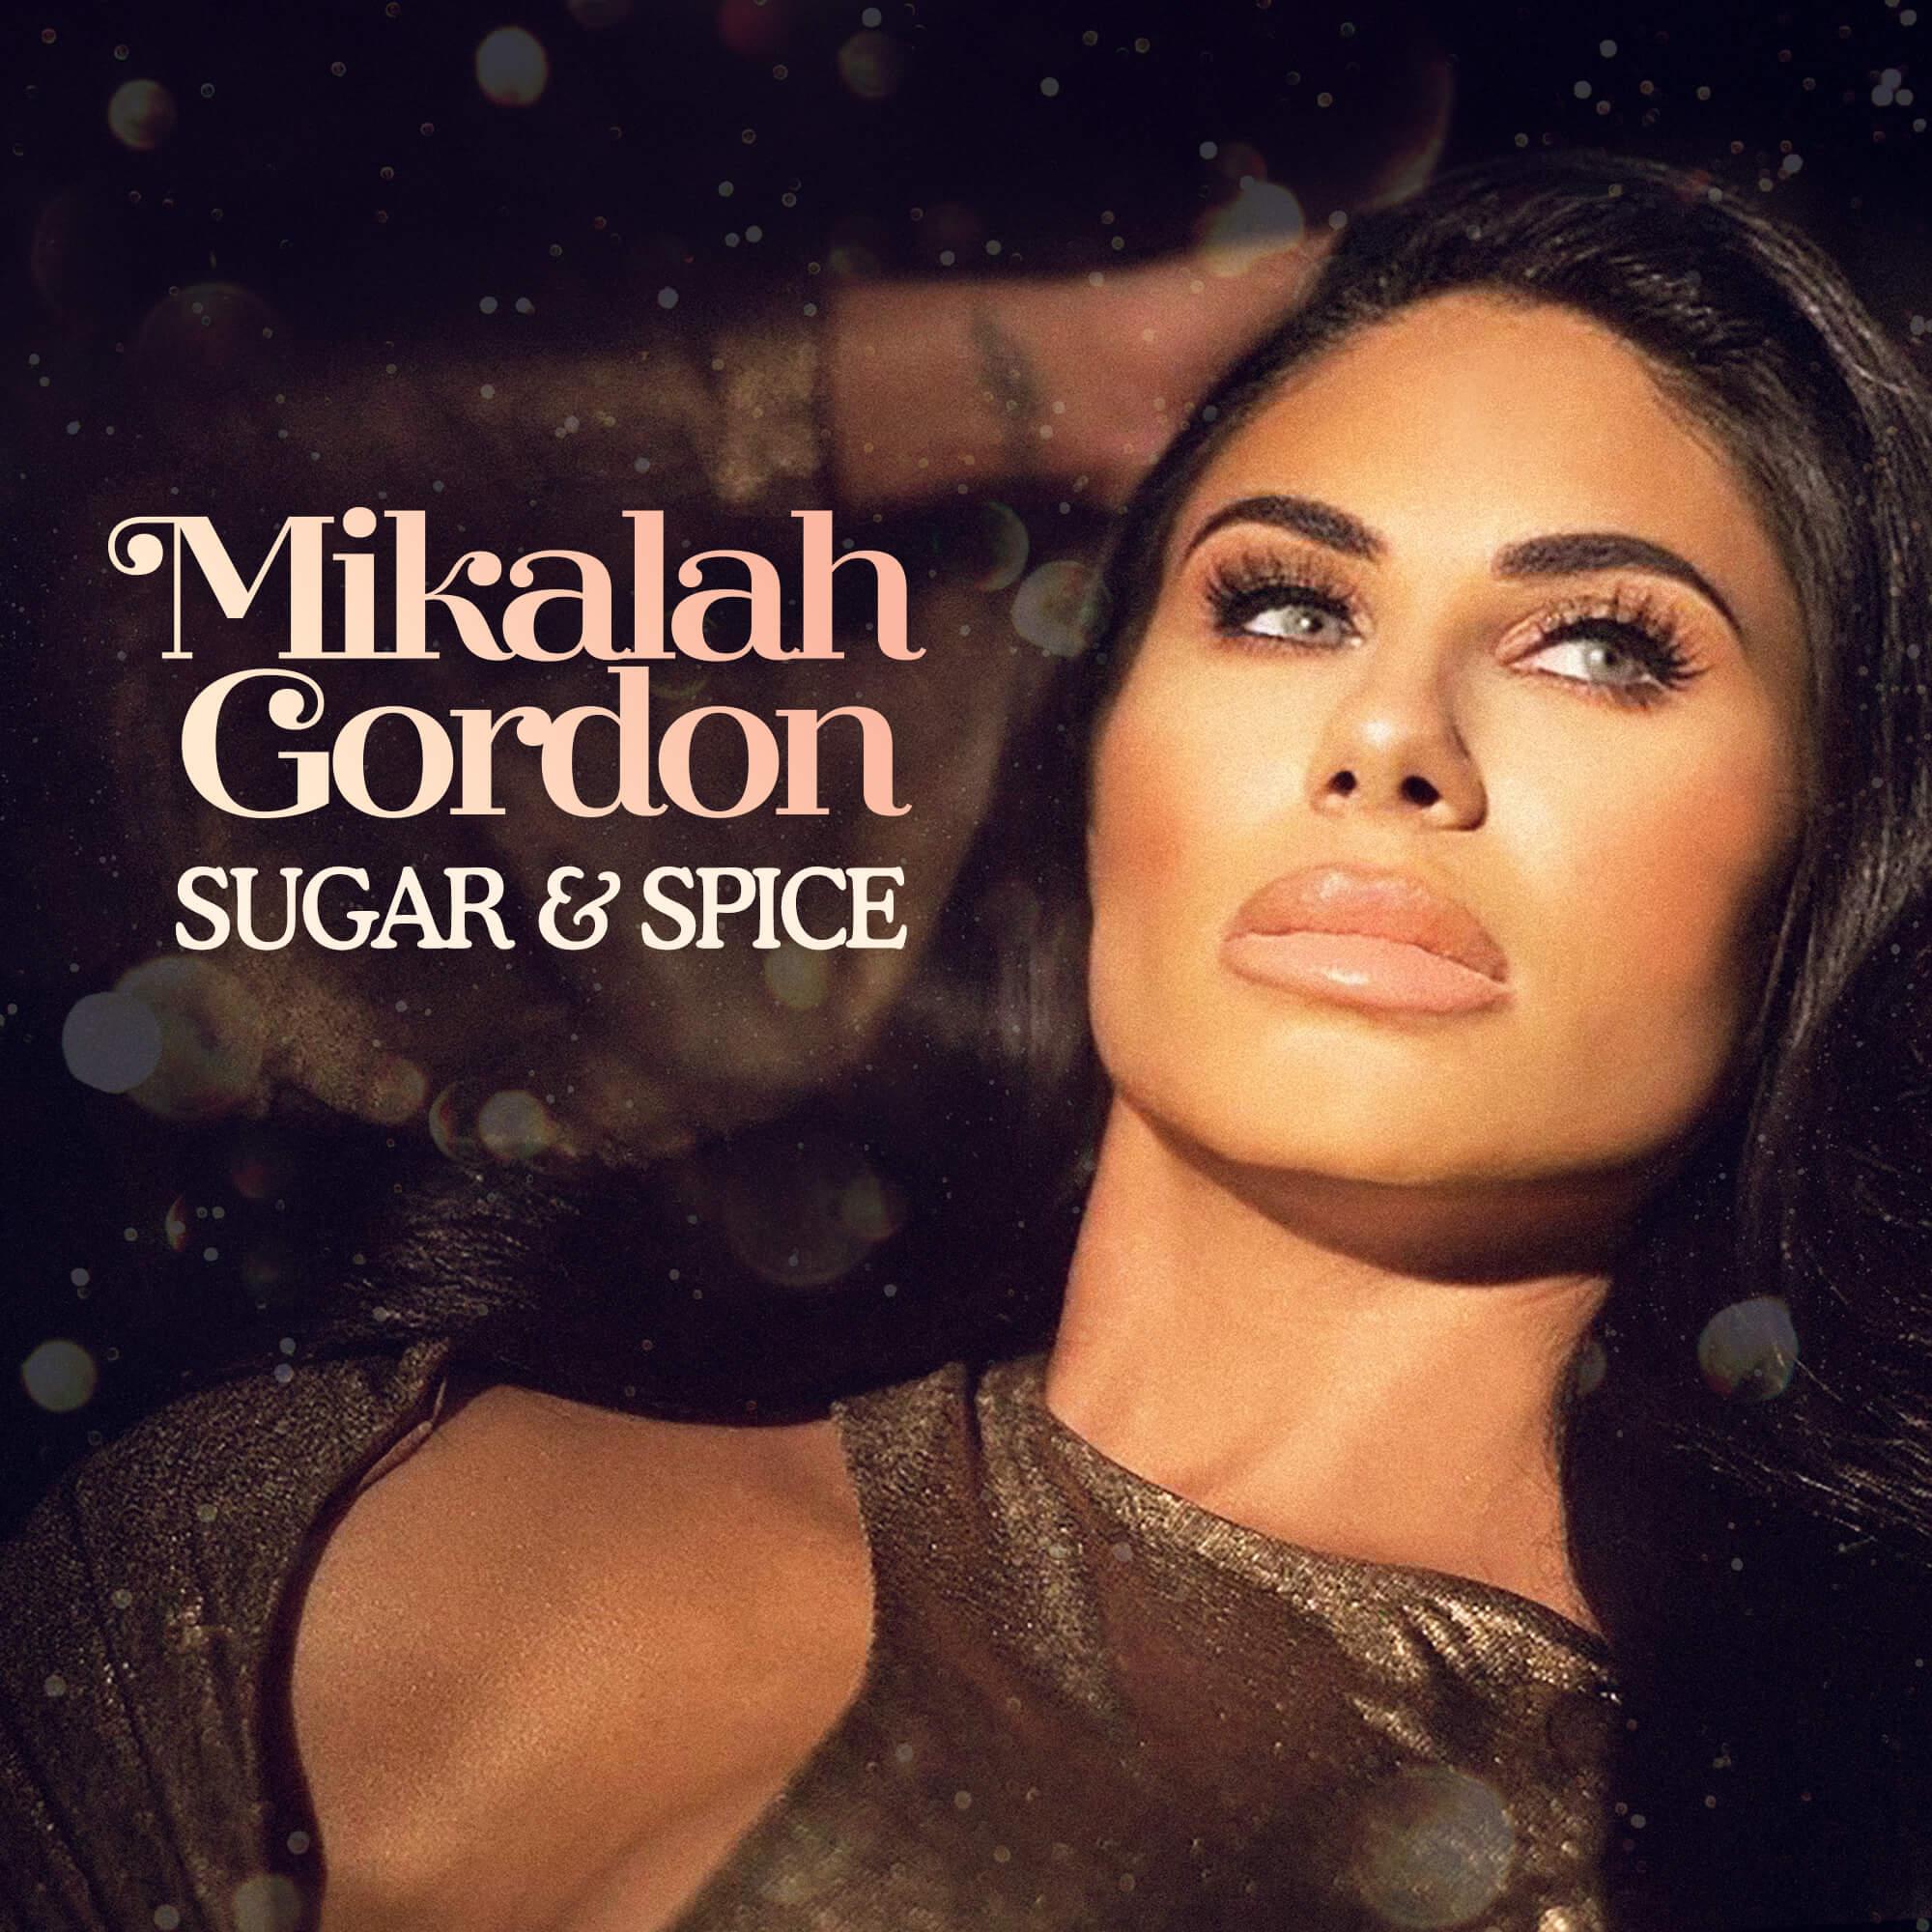 Mikalah Gordon